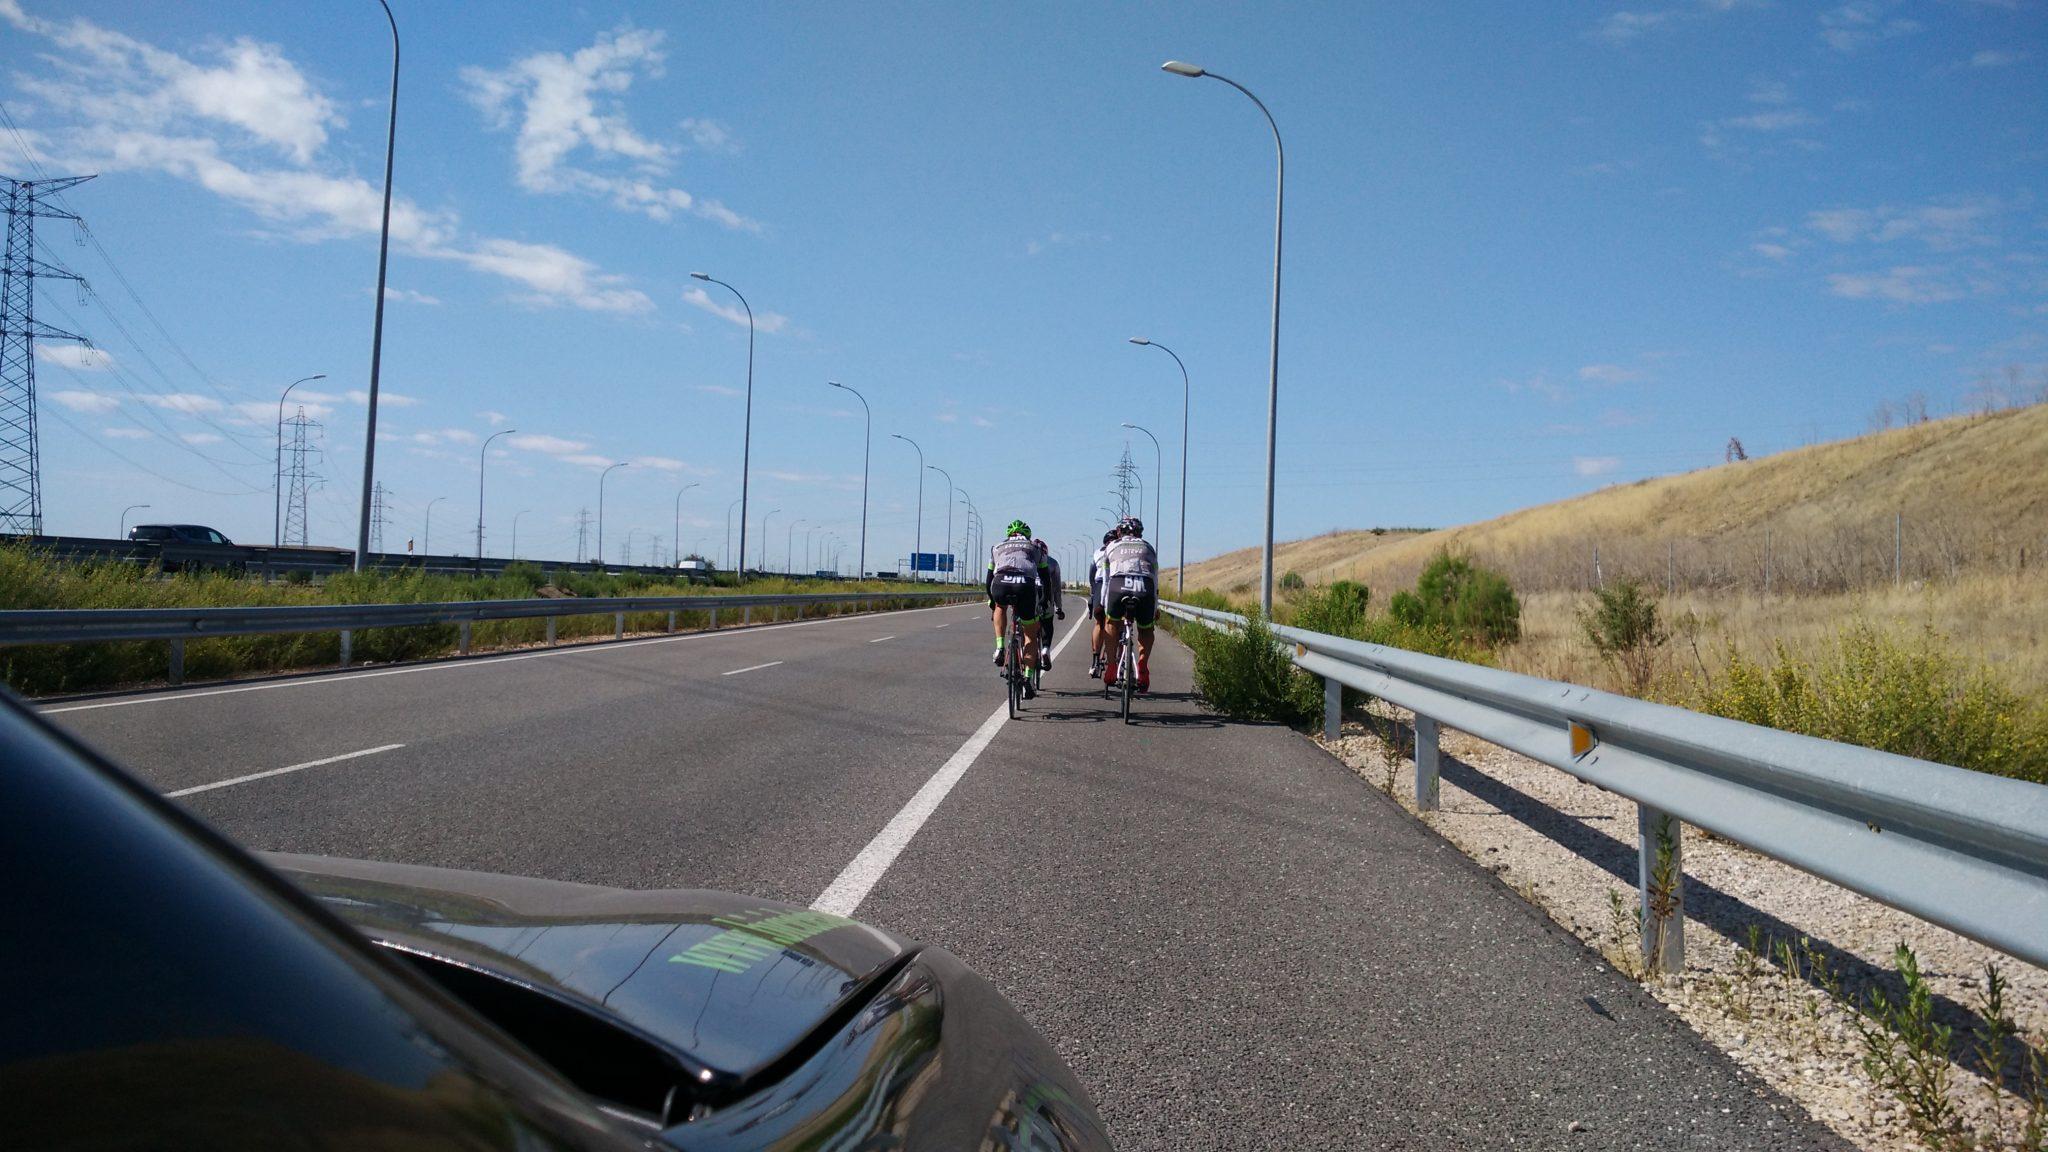 Grupeta_BM_Salida_Morata_Tajuña_16092017_2_Biciletas Mañas BM-Tienda-de-venta-y-reparacion-de-bicicletas-Ridley-Madrid